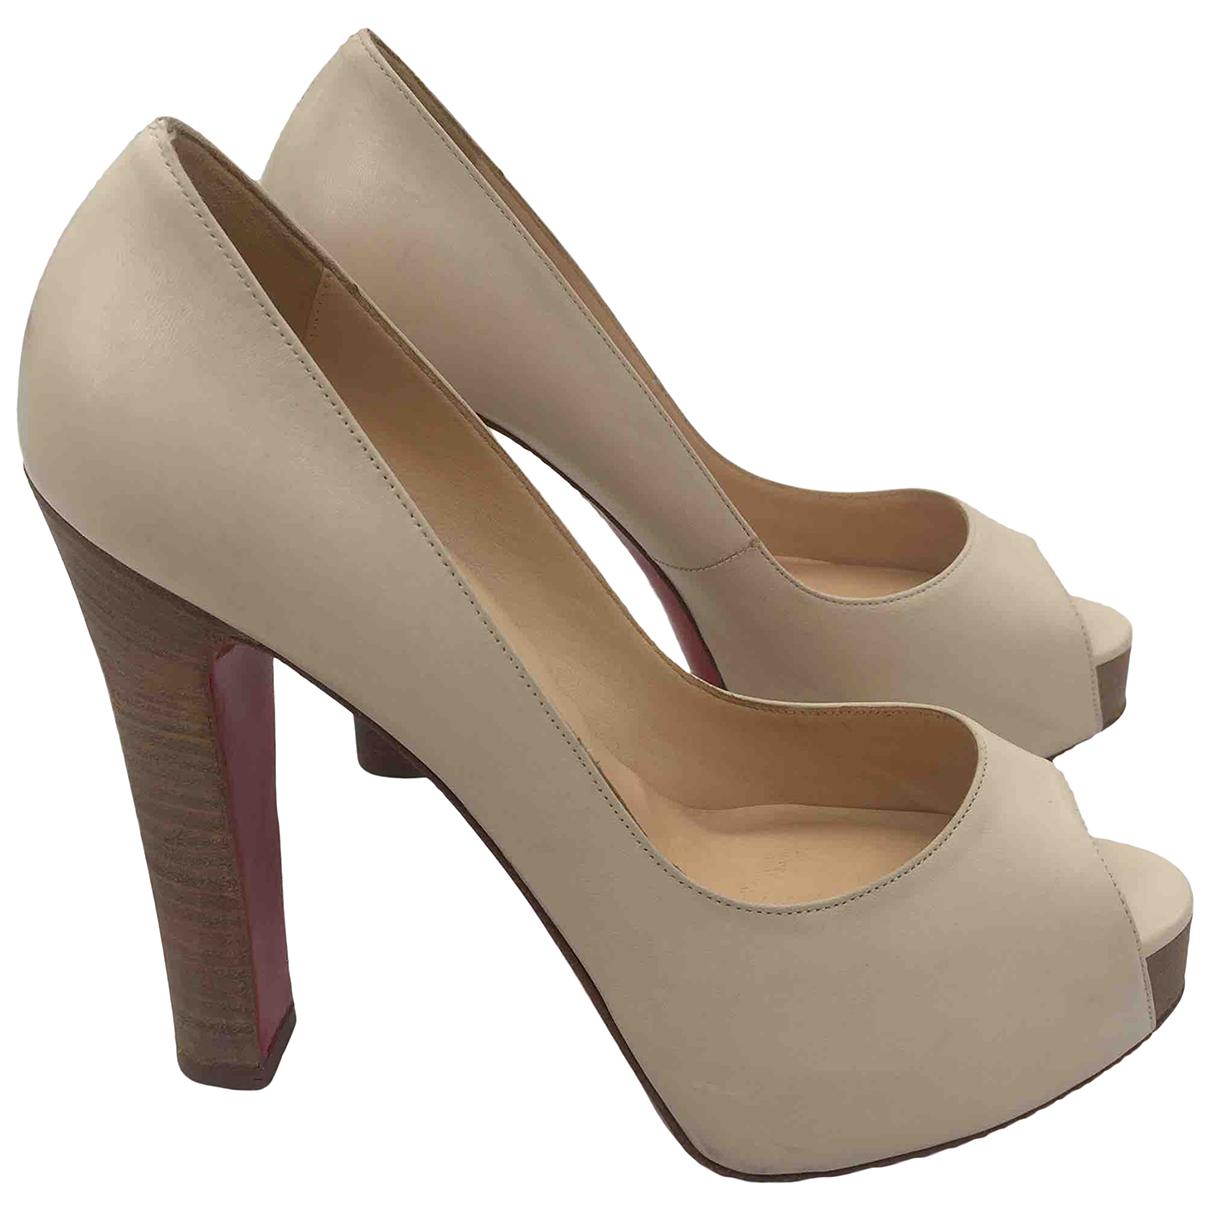 Christian Louboutin \N Beige Leather Heels for Women 39.5 EU